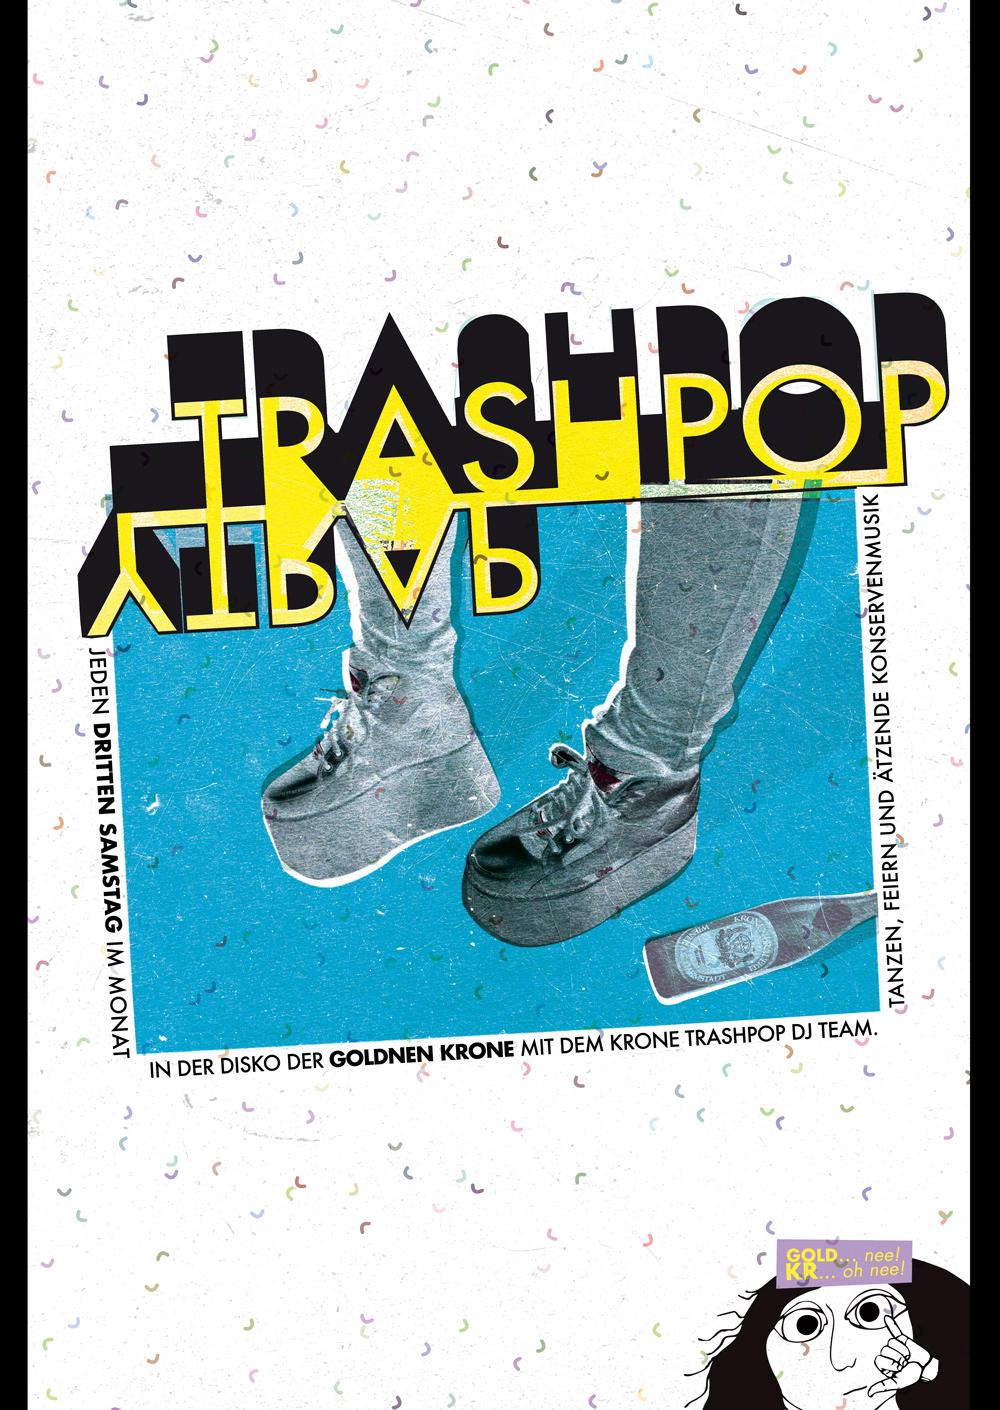 Trashpop